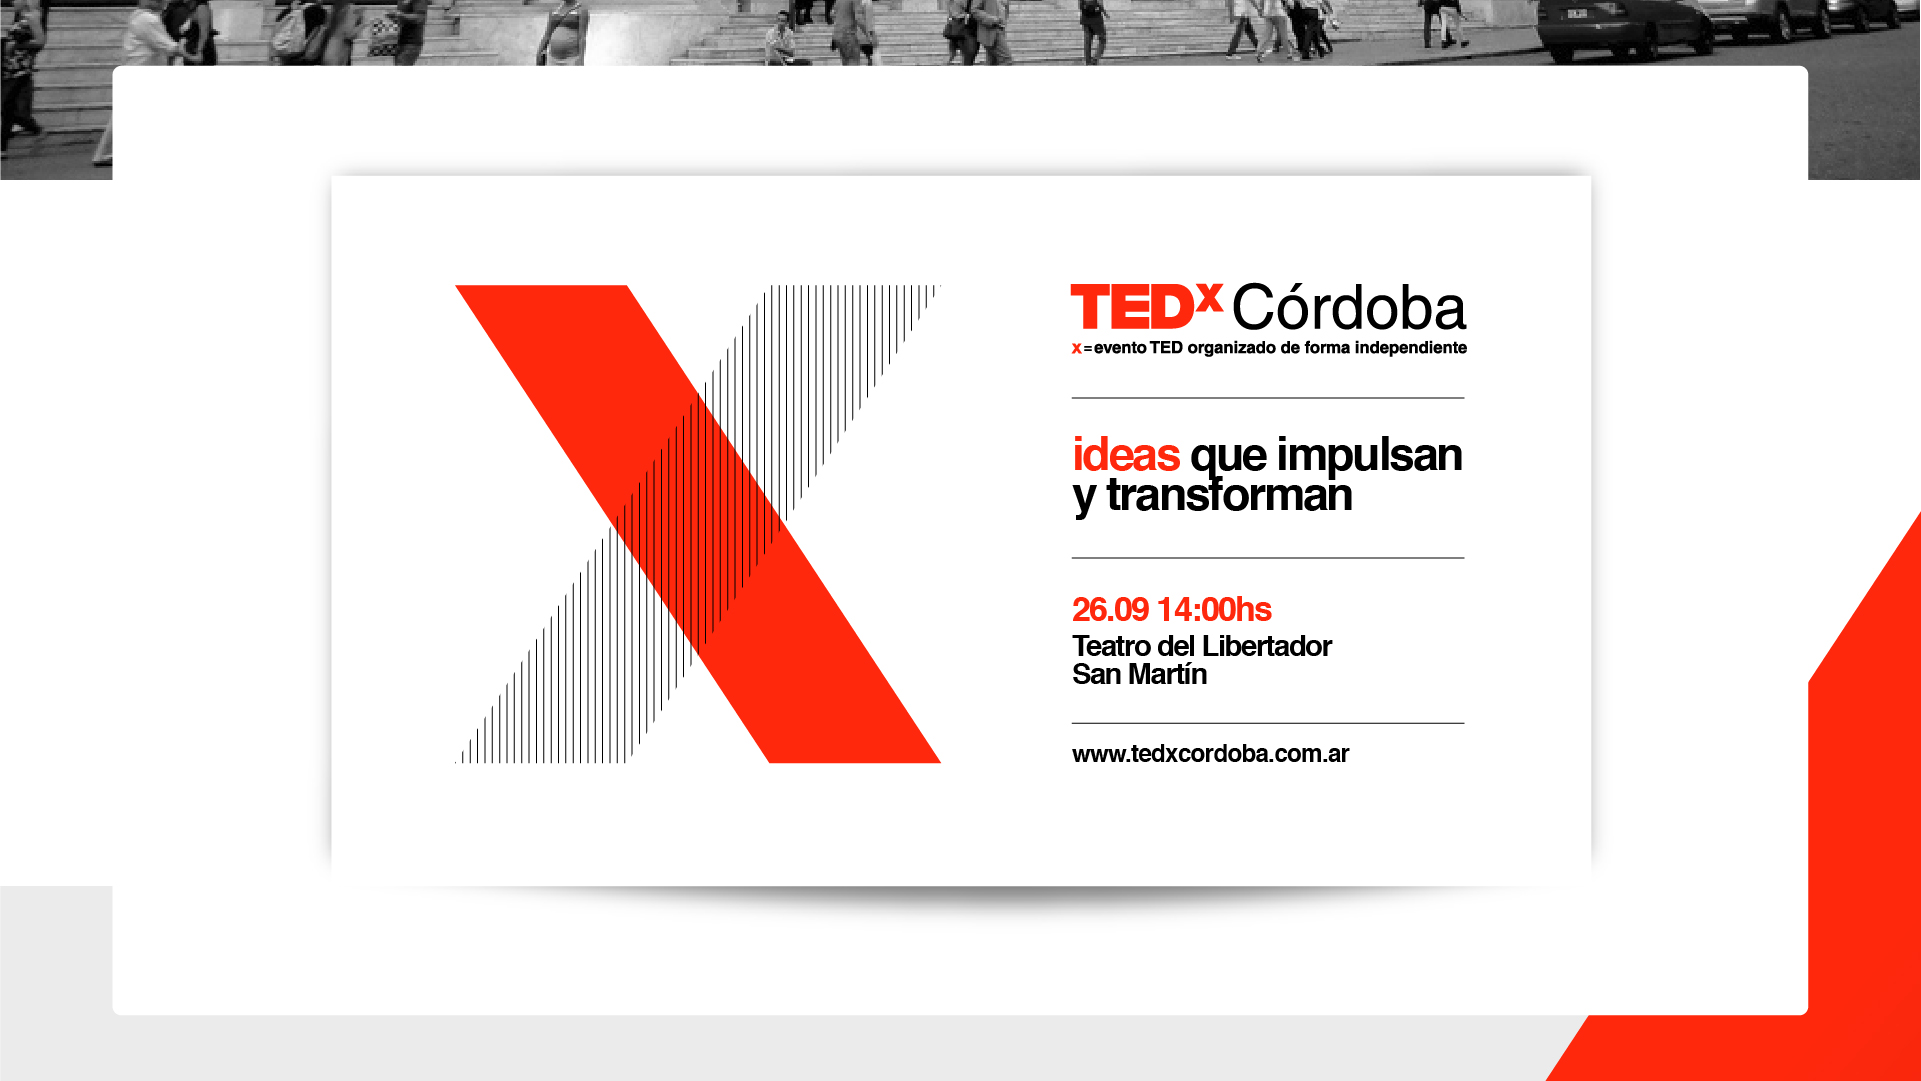 TEDx Cordoba